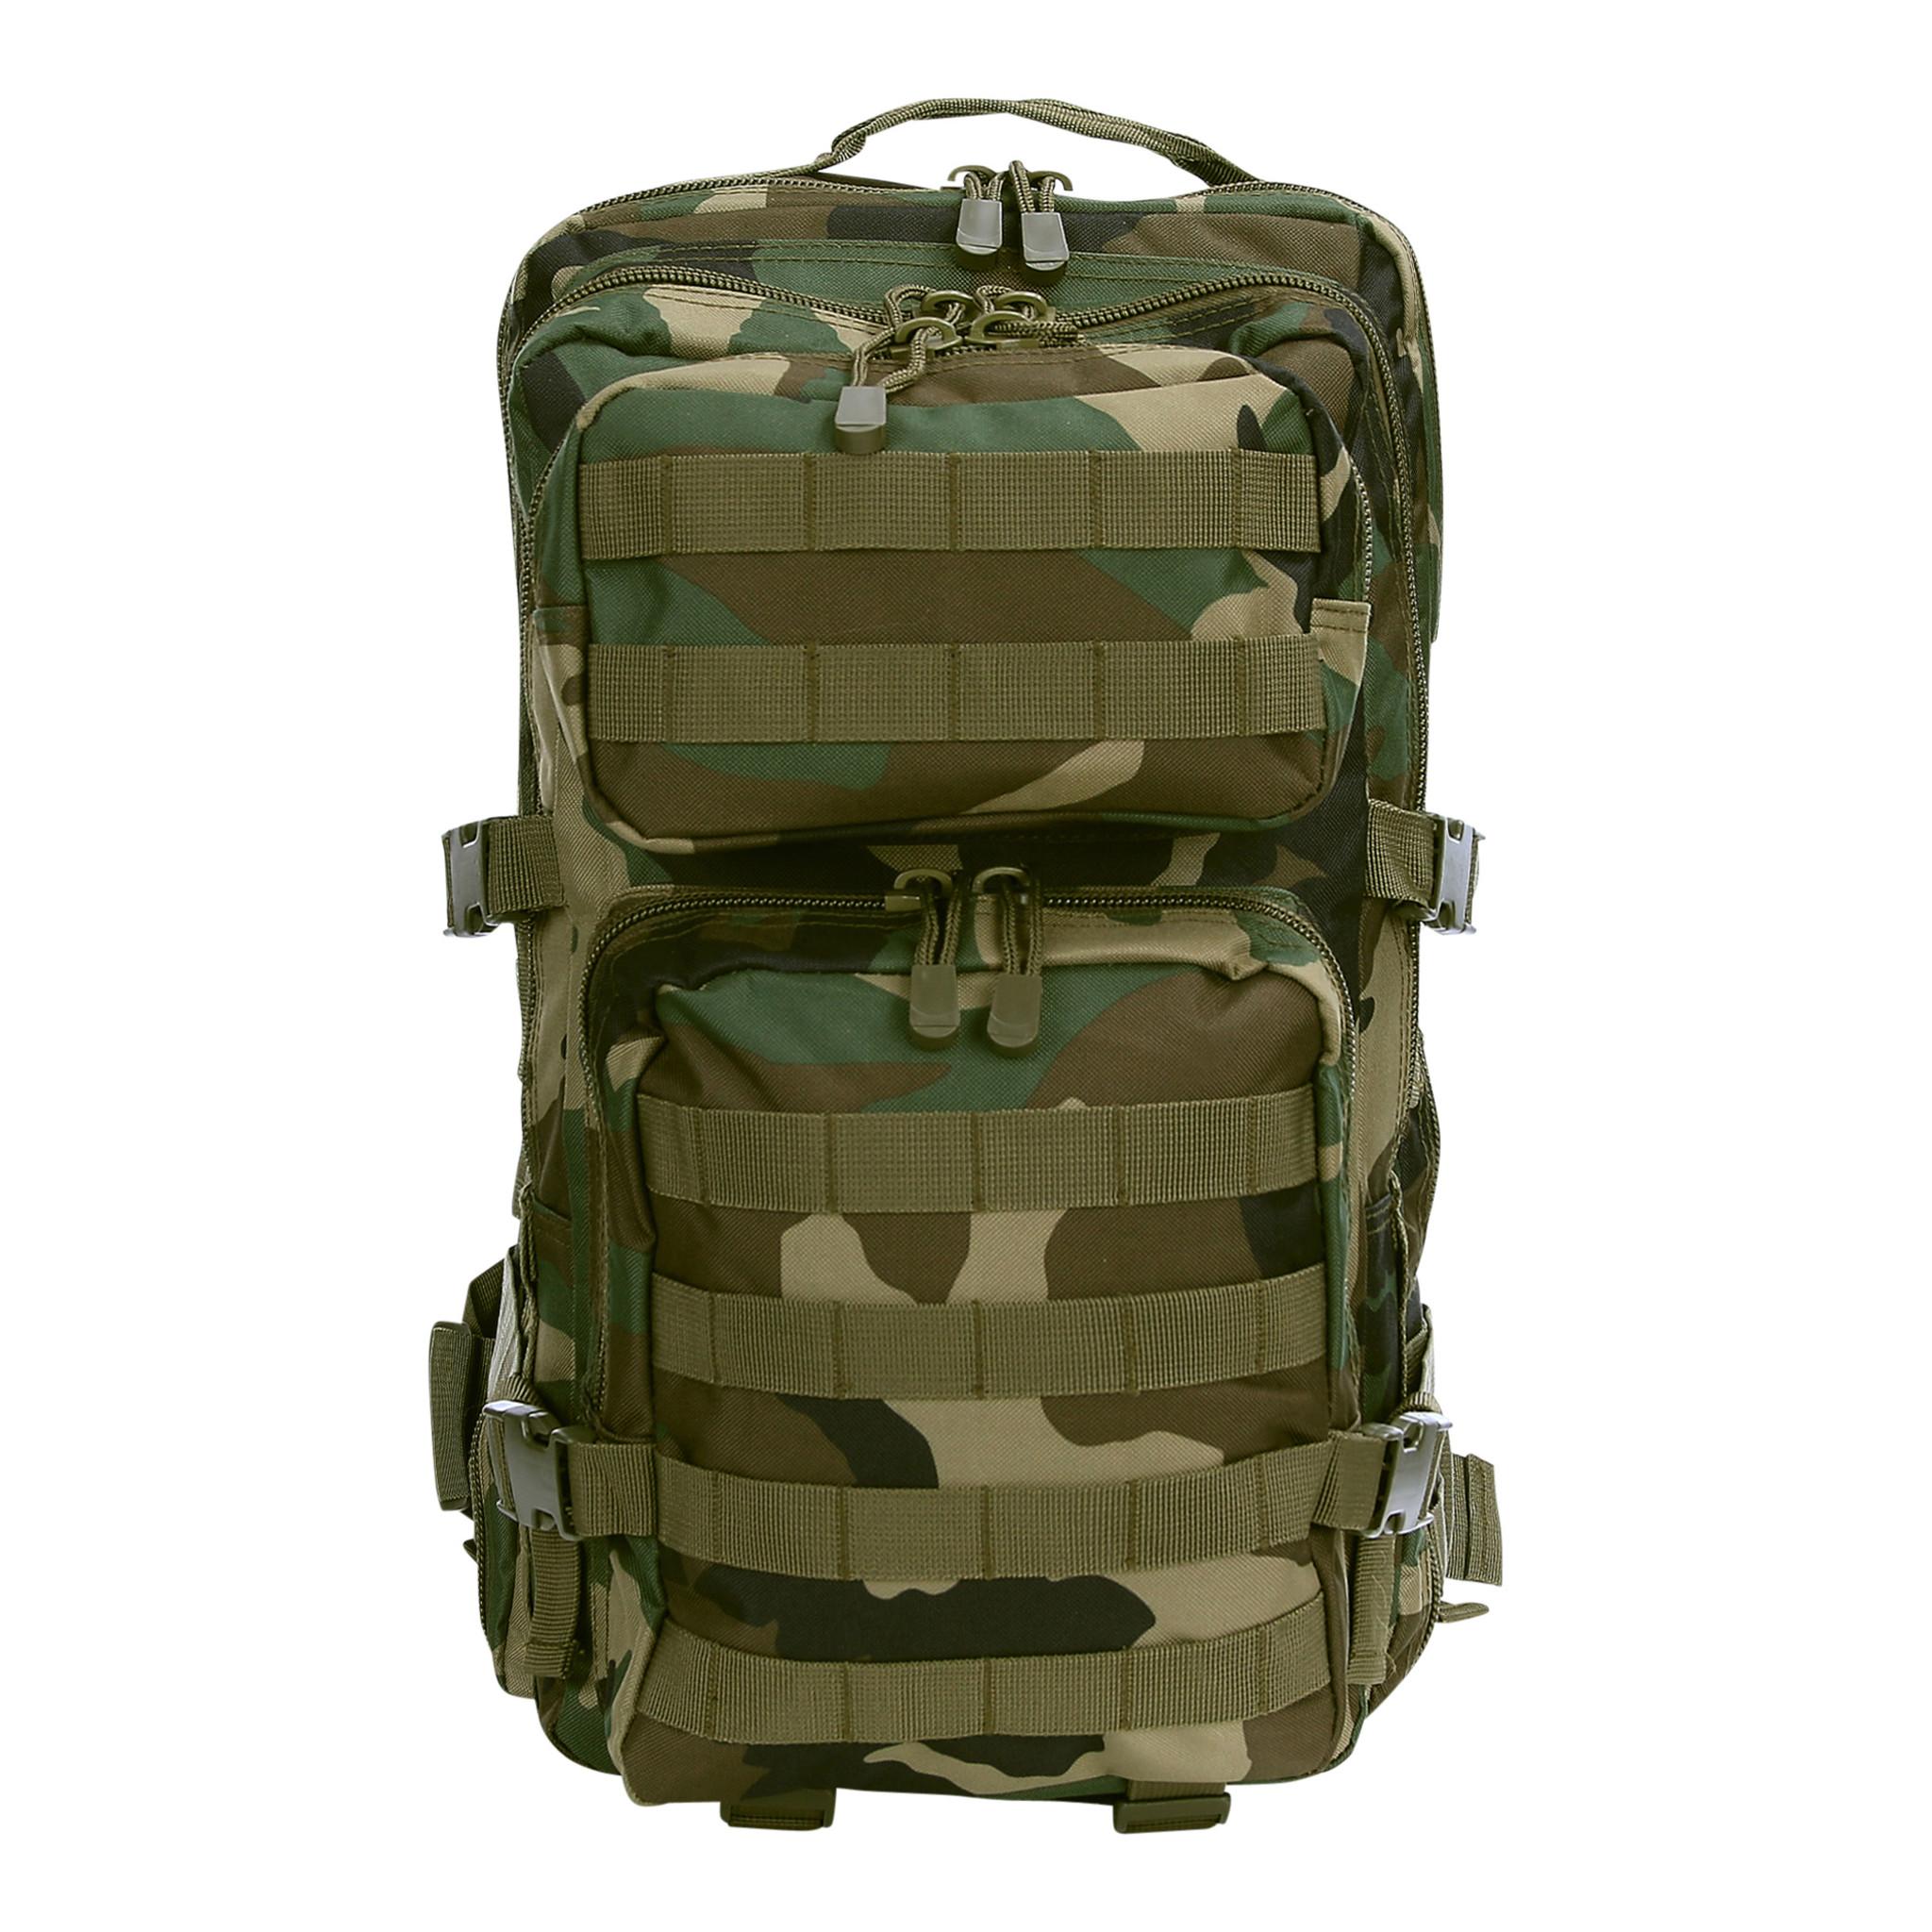 101 INC Backpack Mountain - 45 Liter - Woodland